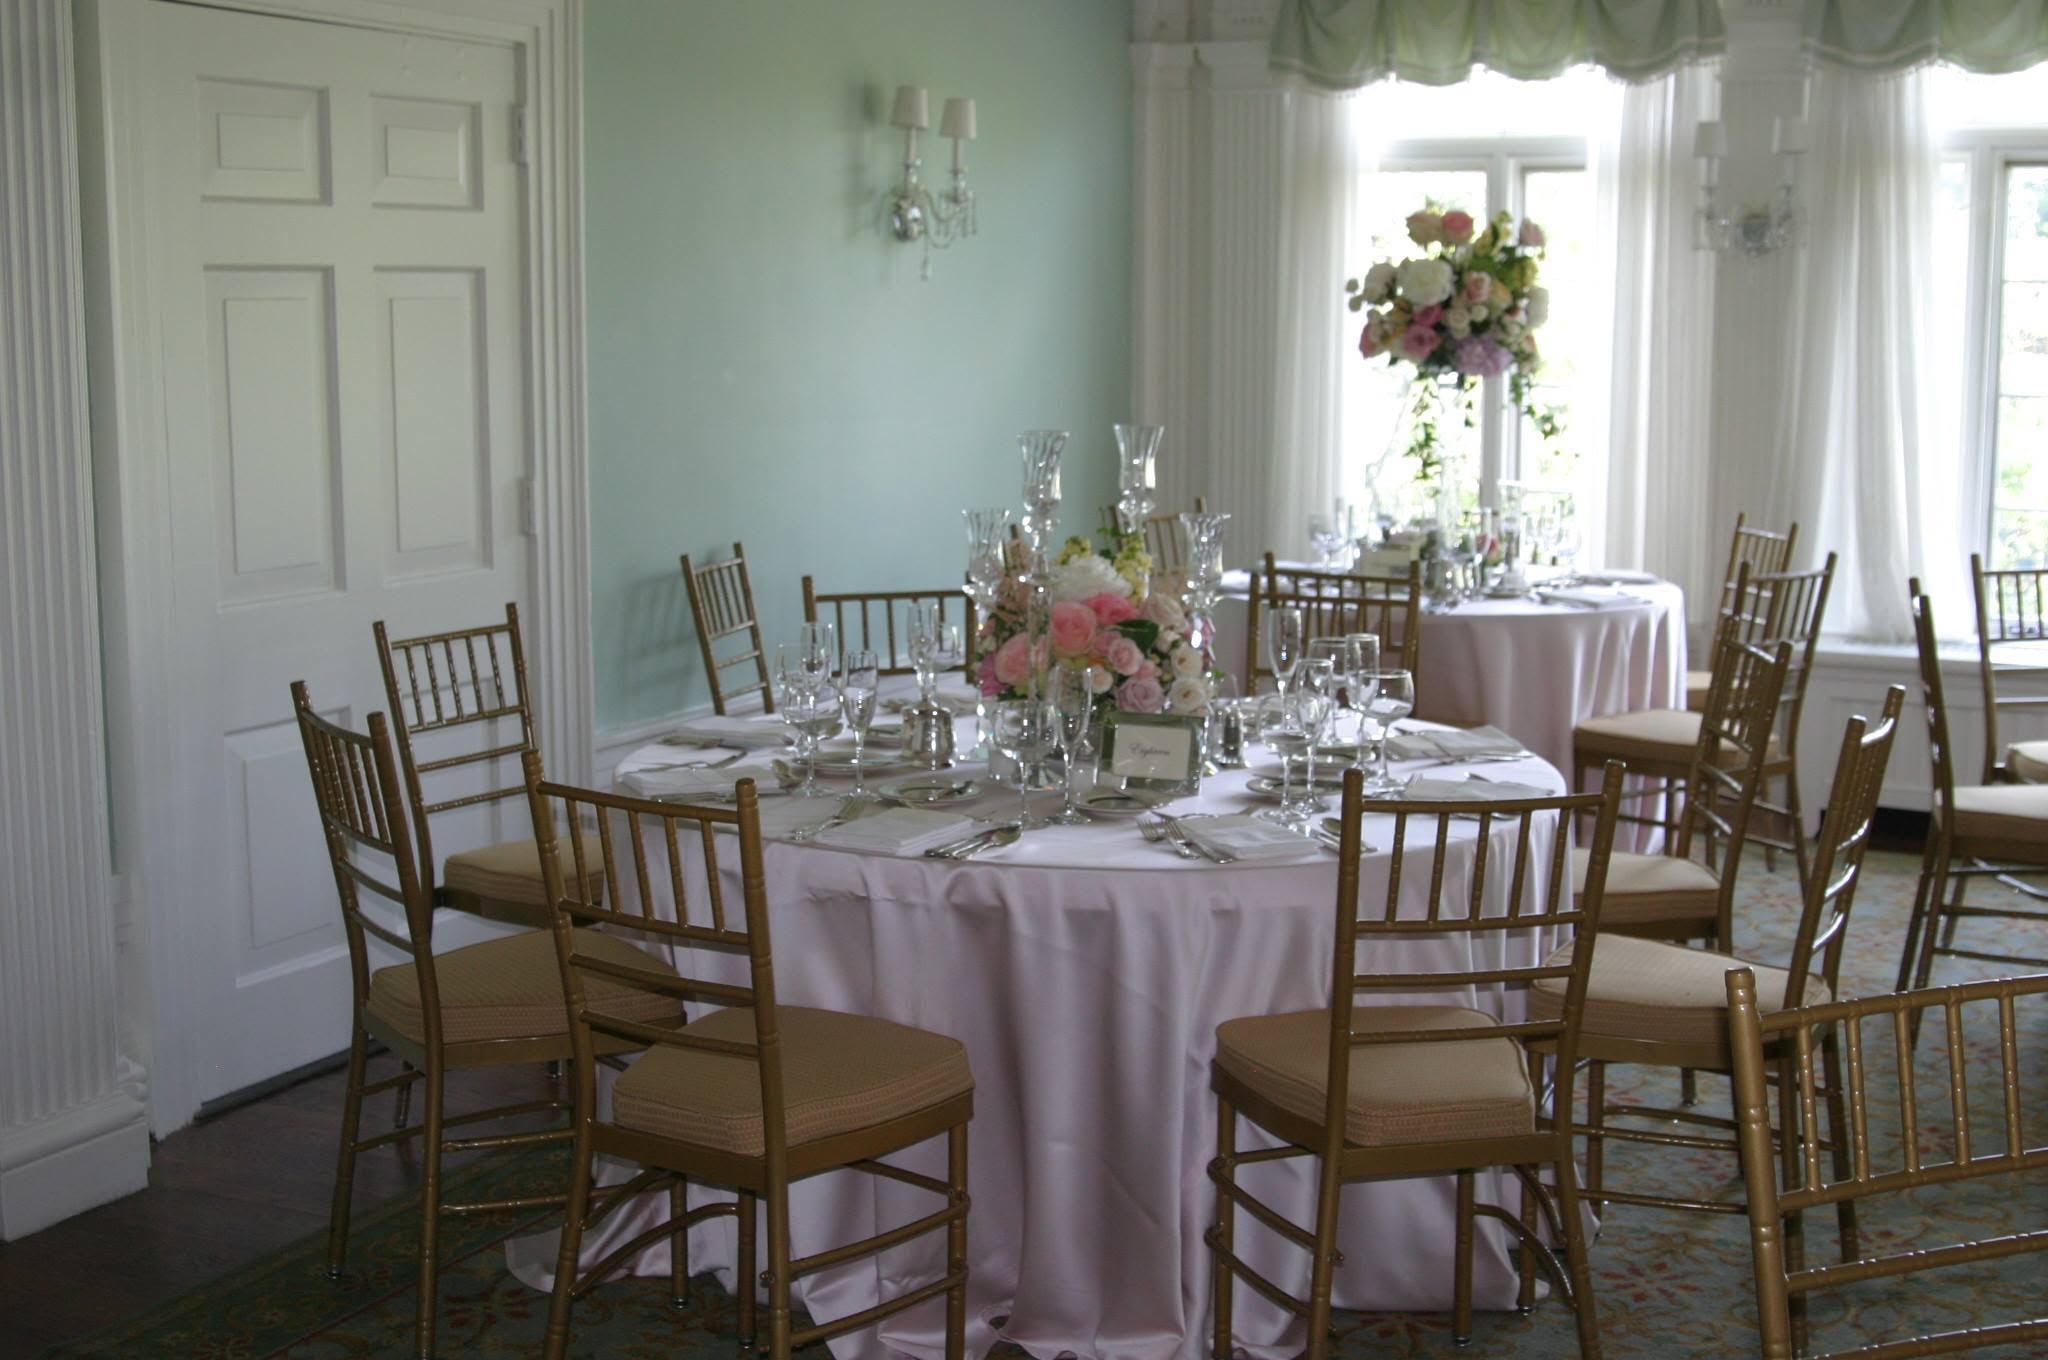 pa-wedding-linens-30.jpg